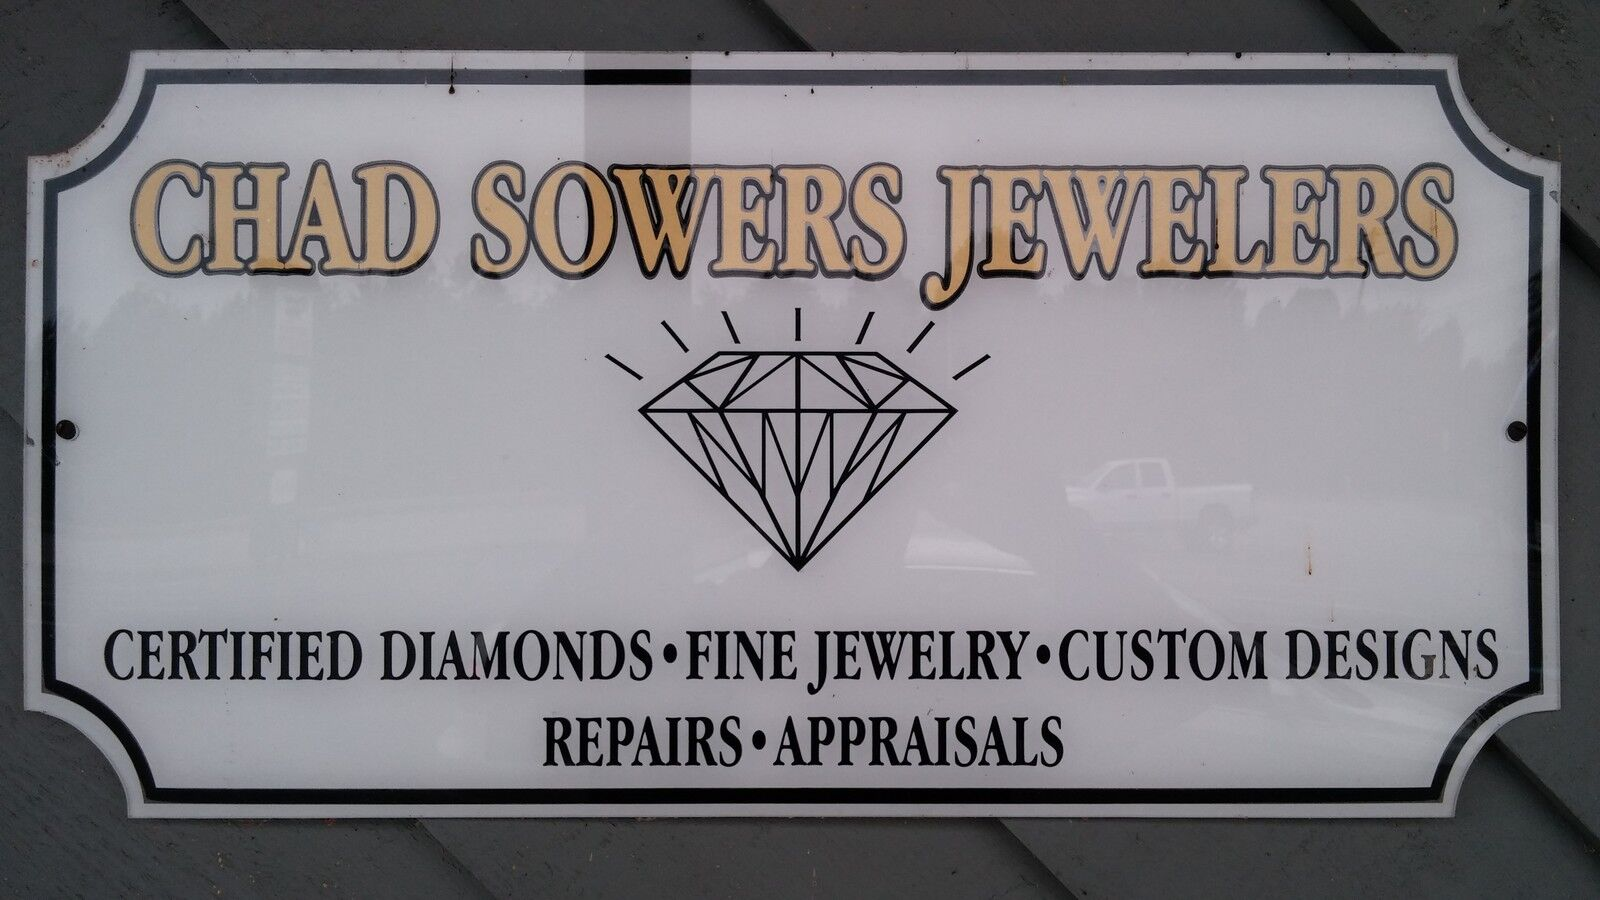 Chad Sowers Jewelers